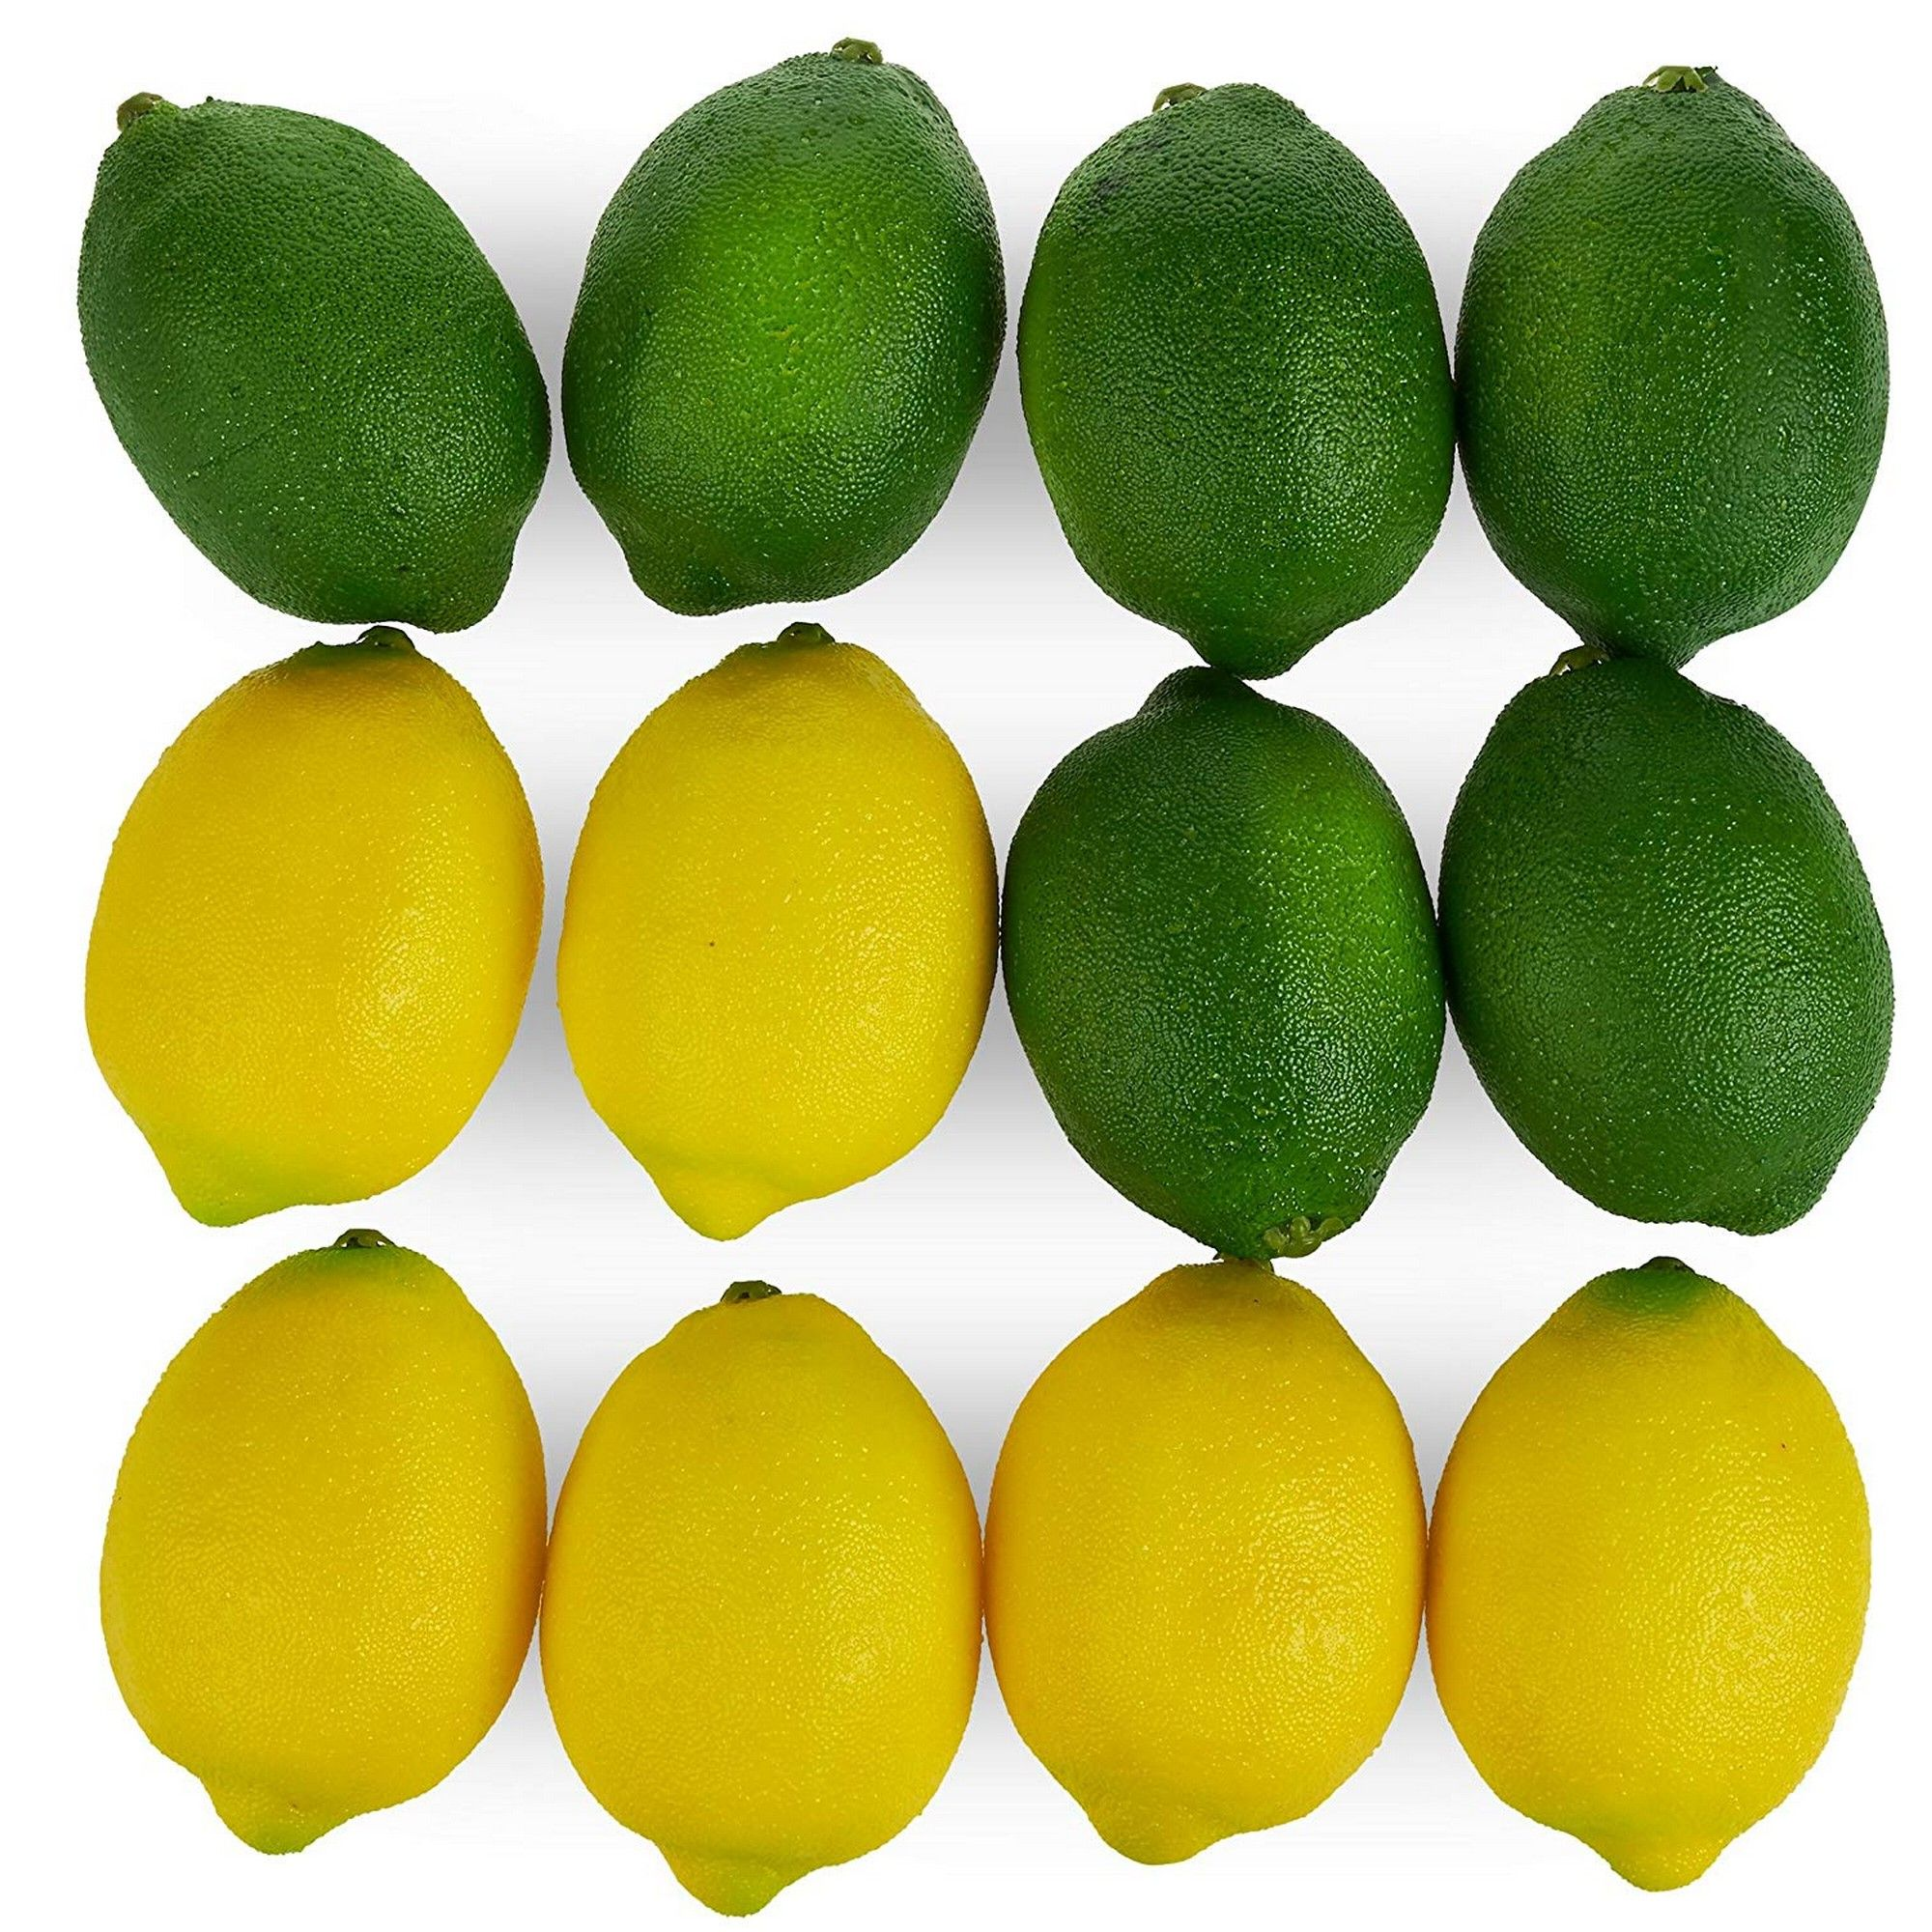 2 Strings Limes Lemon Lifelike Artificial Fake Fruit Imitation Home Decoration